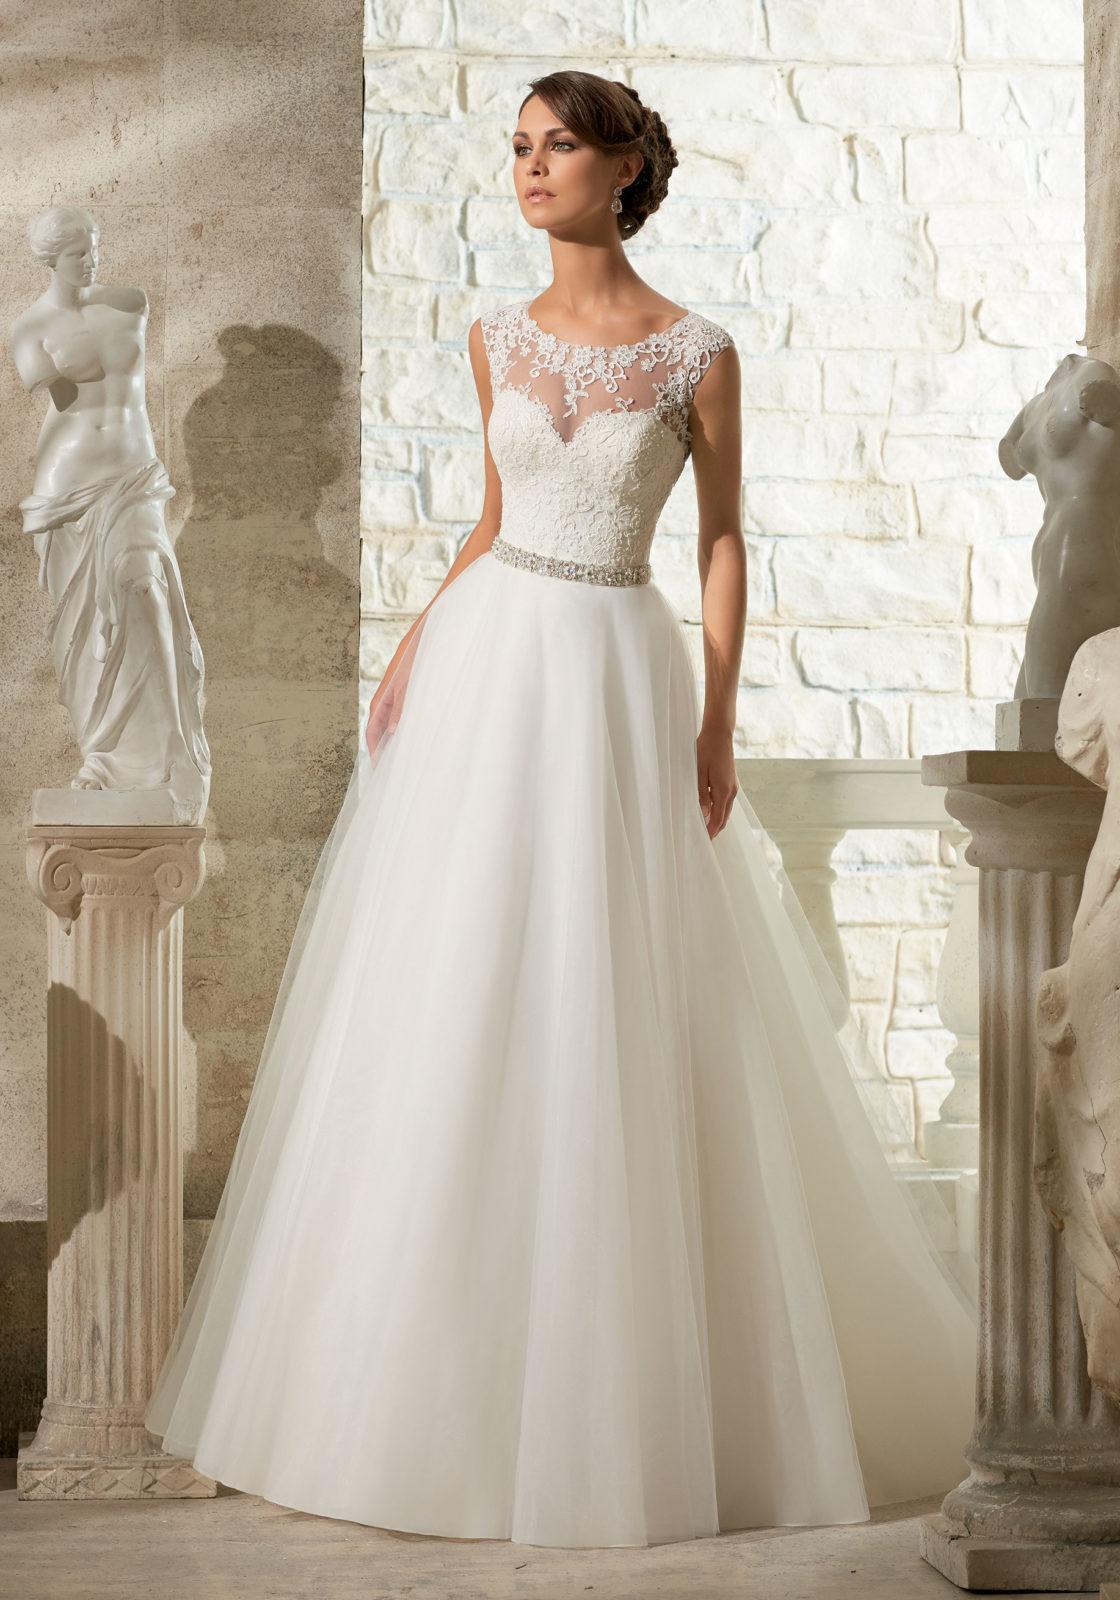 big beautiful wedding dresses photo - 1